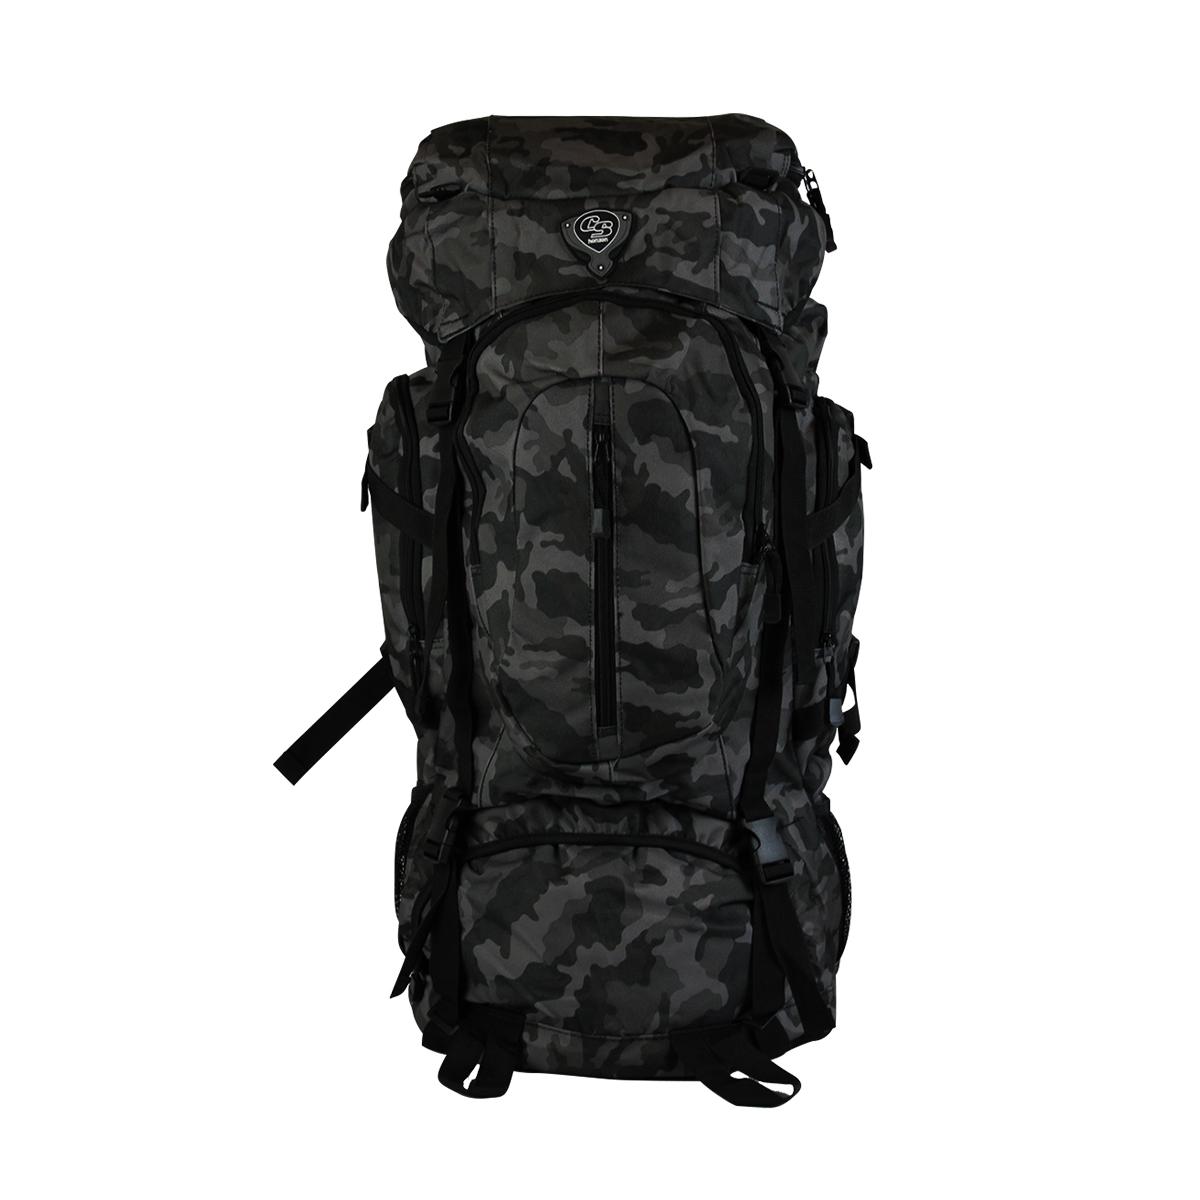 Mochila De Camping Camuflada 50 Litros Preta MC9171 Clio